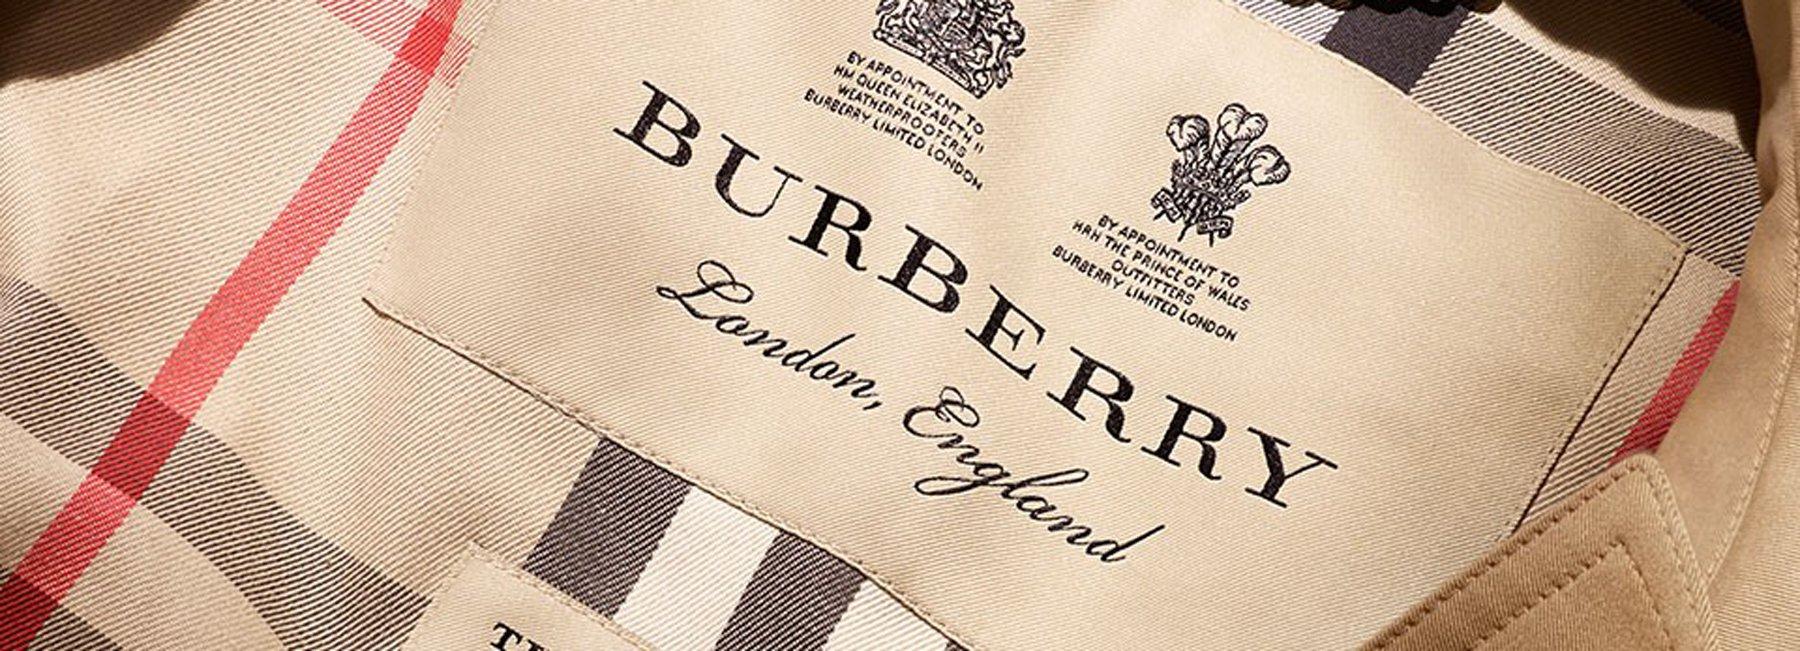 burberry-burns-bags-clothes-perfume-worth-28-million-counterfeit-designboom-1800.jpg